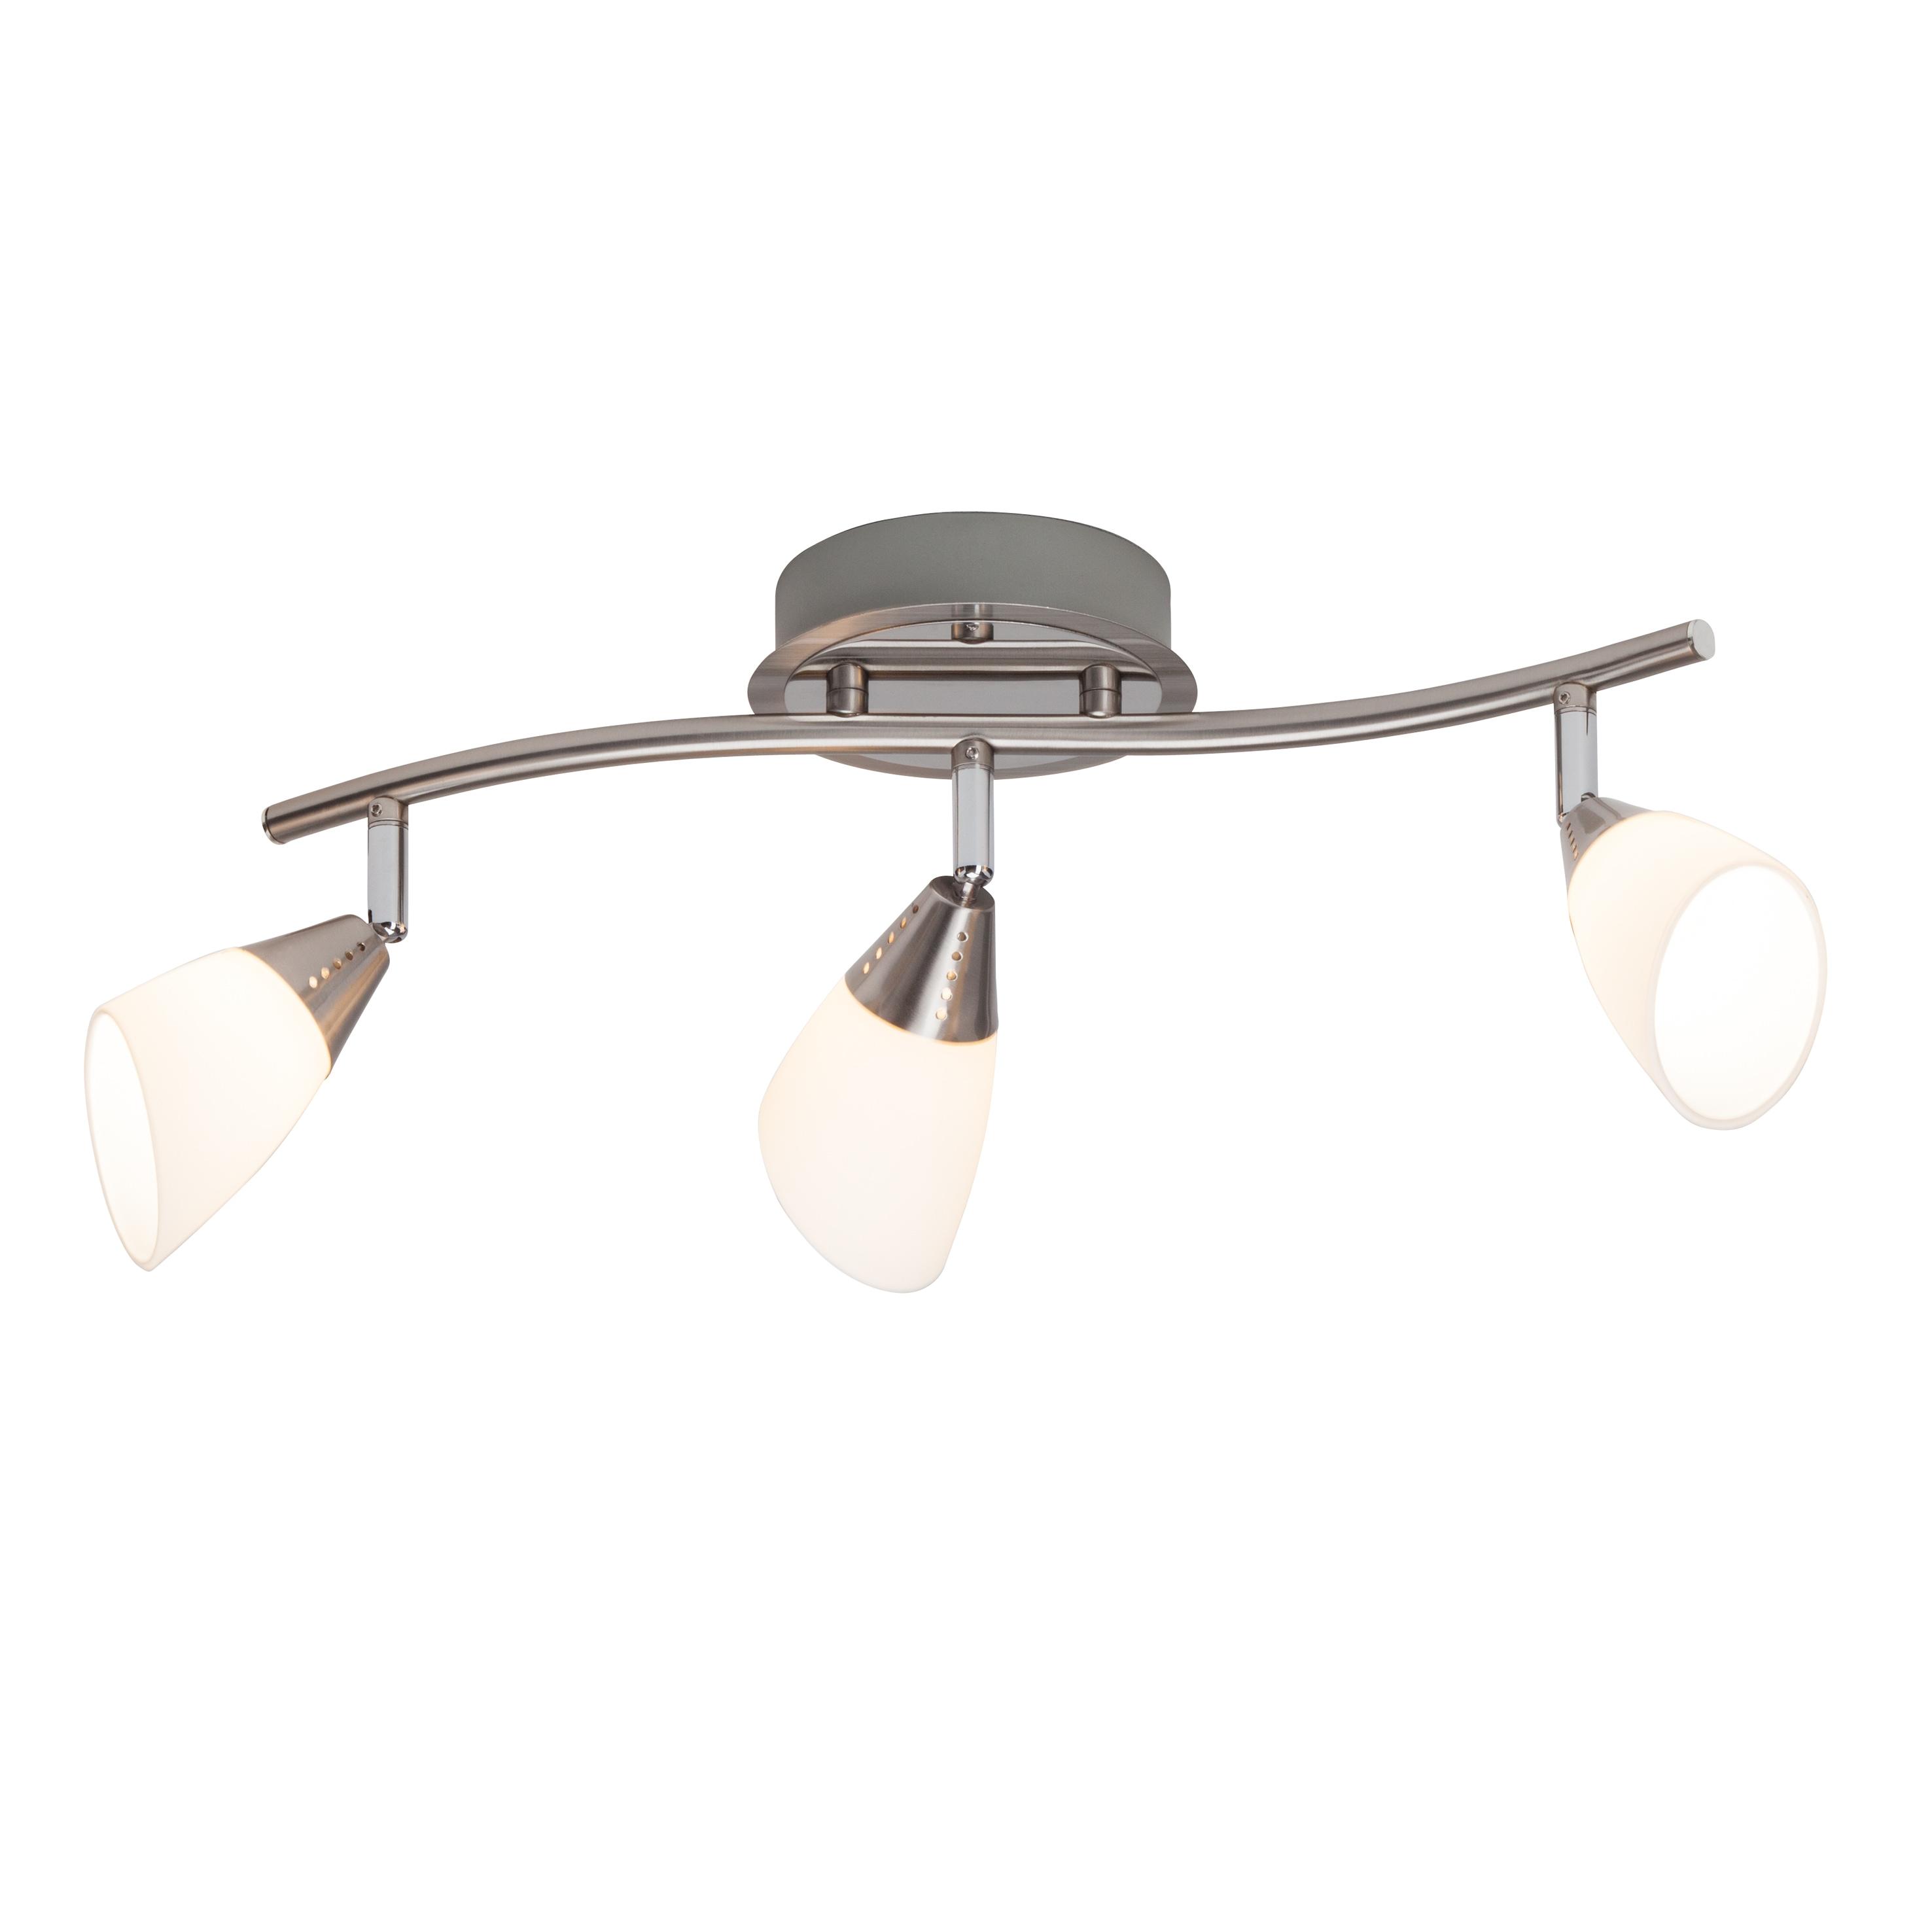 Brilliant Leuchten Opalina LED Spotrohr 3flg eisen chrom/weiÃY